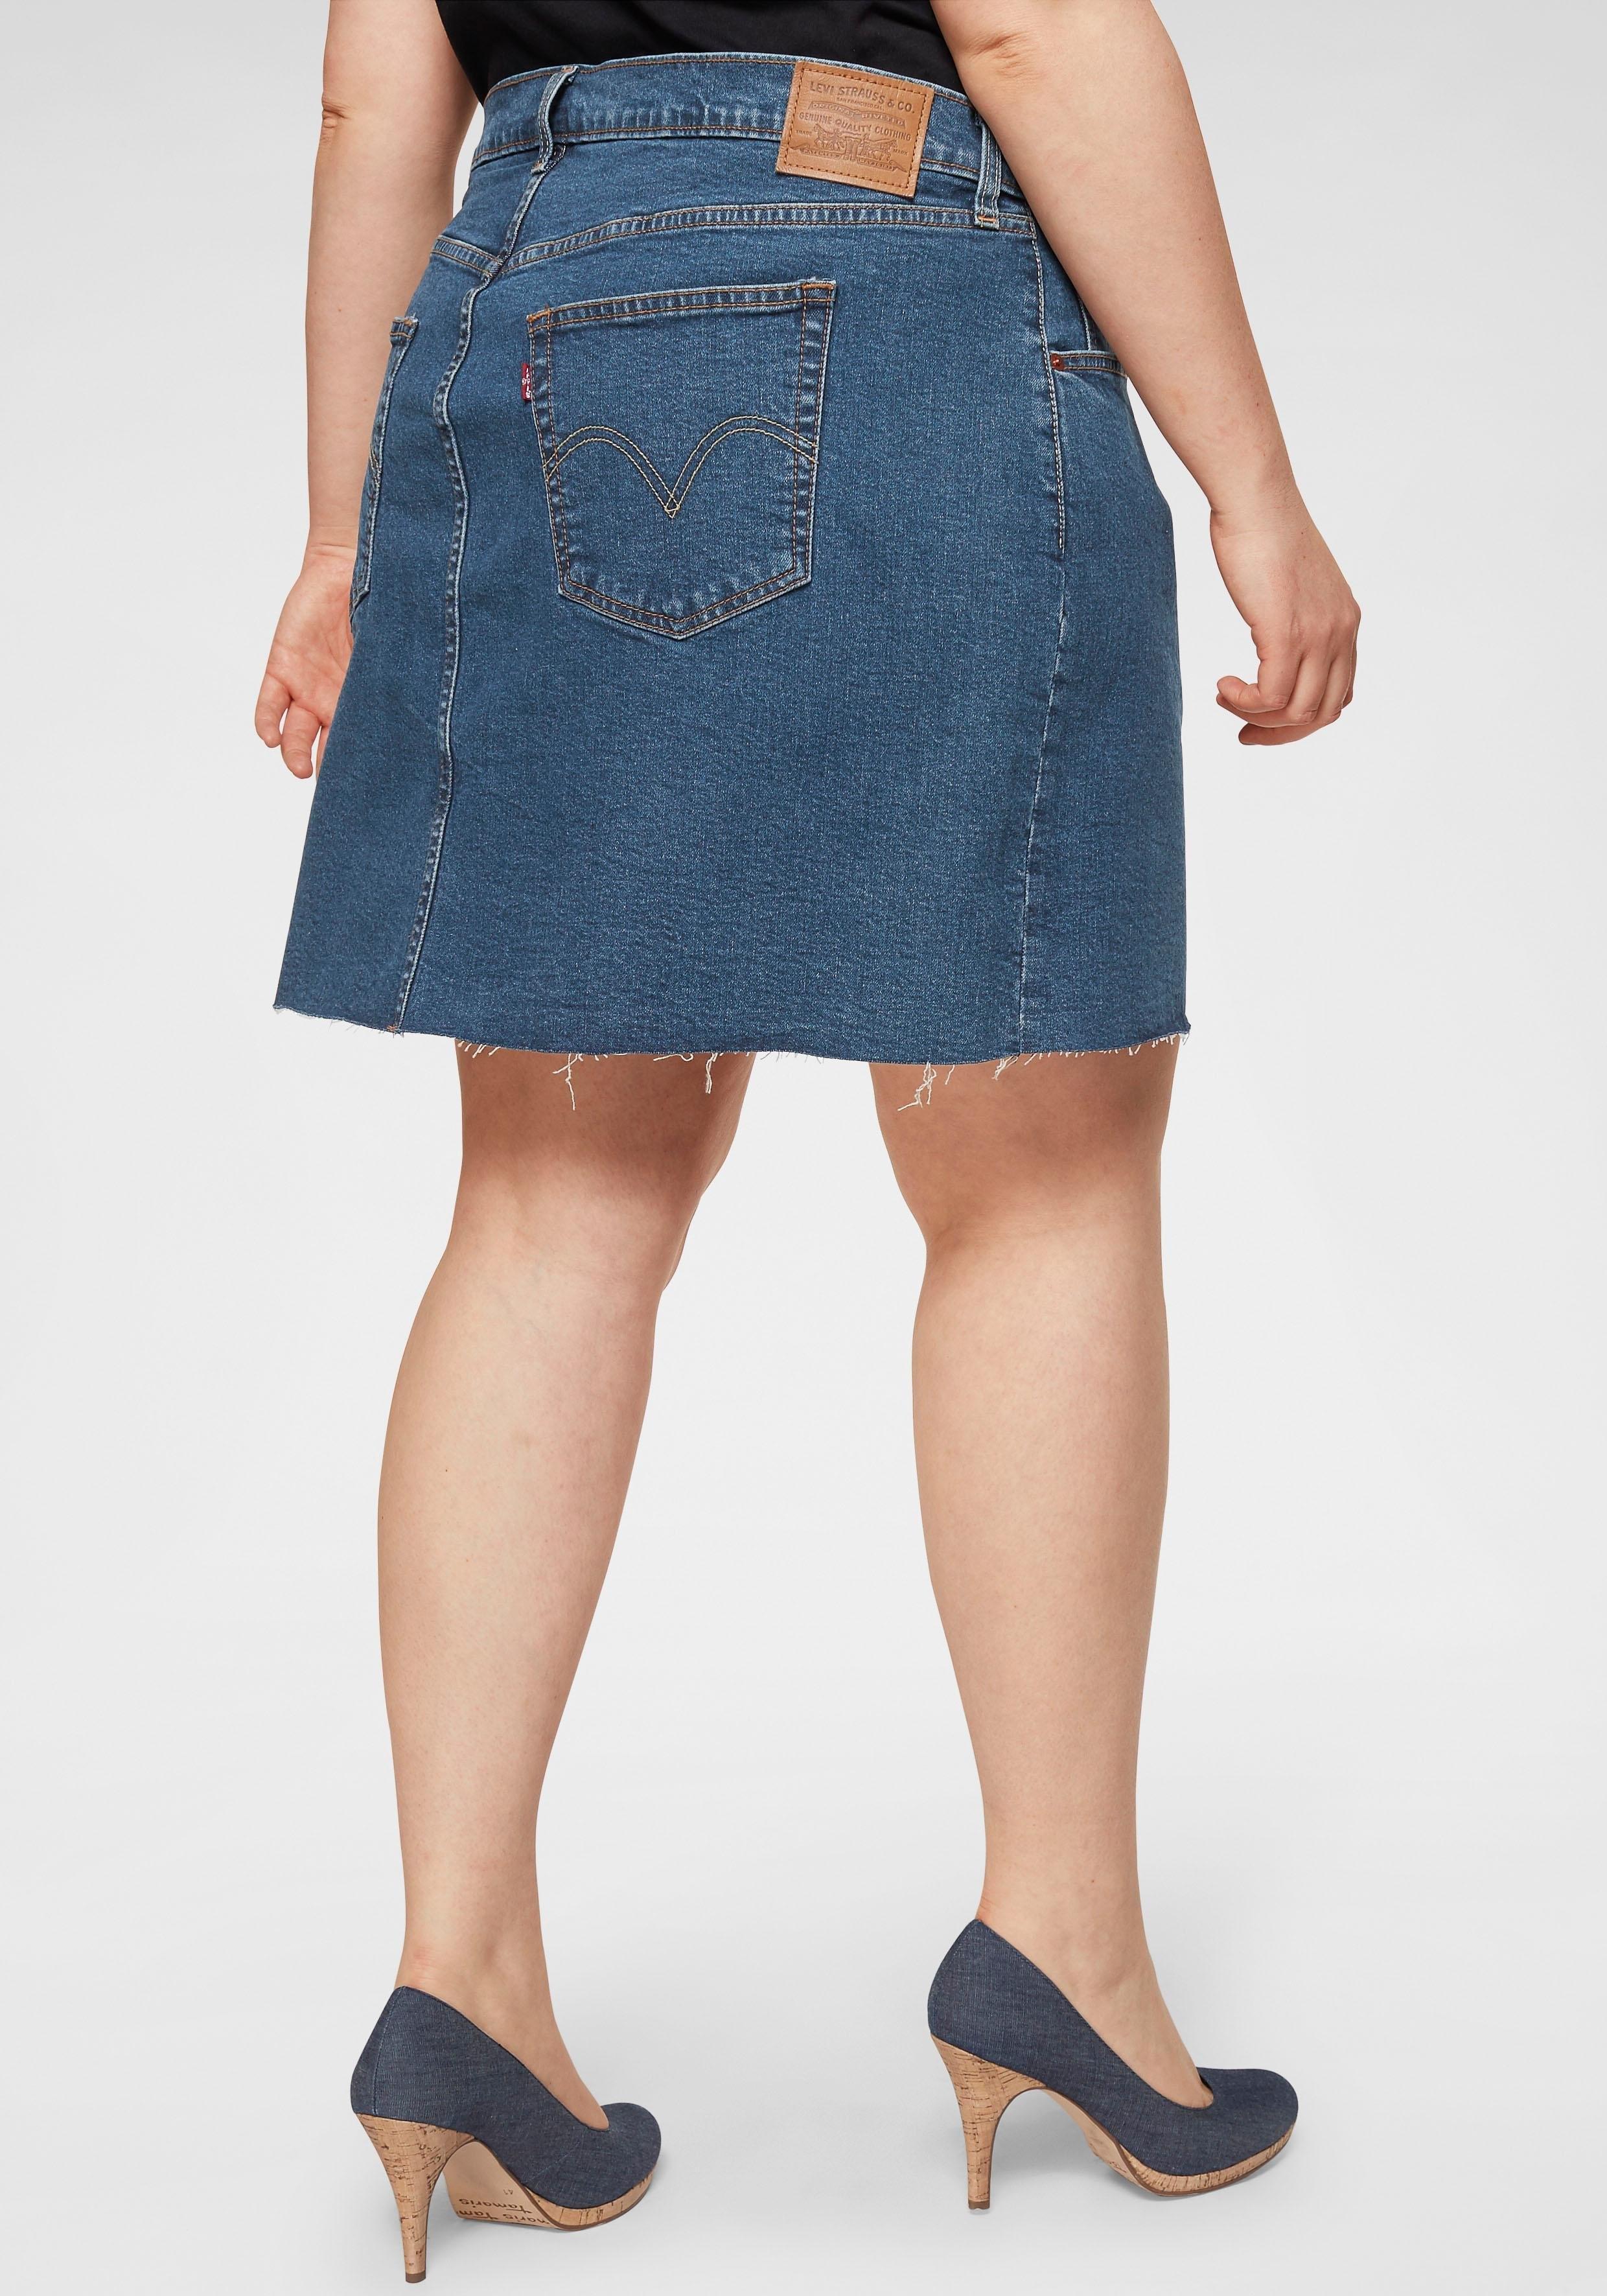 LEVI'S ® Plus jeansrok »Plus Size Deconstructed Skirt« bij OTTO online kopen